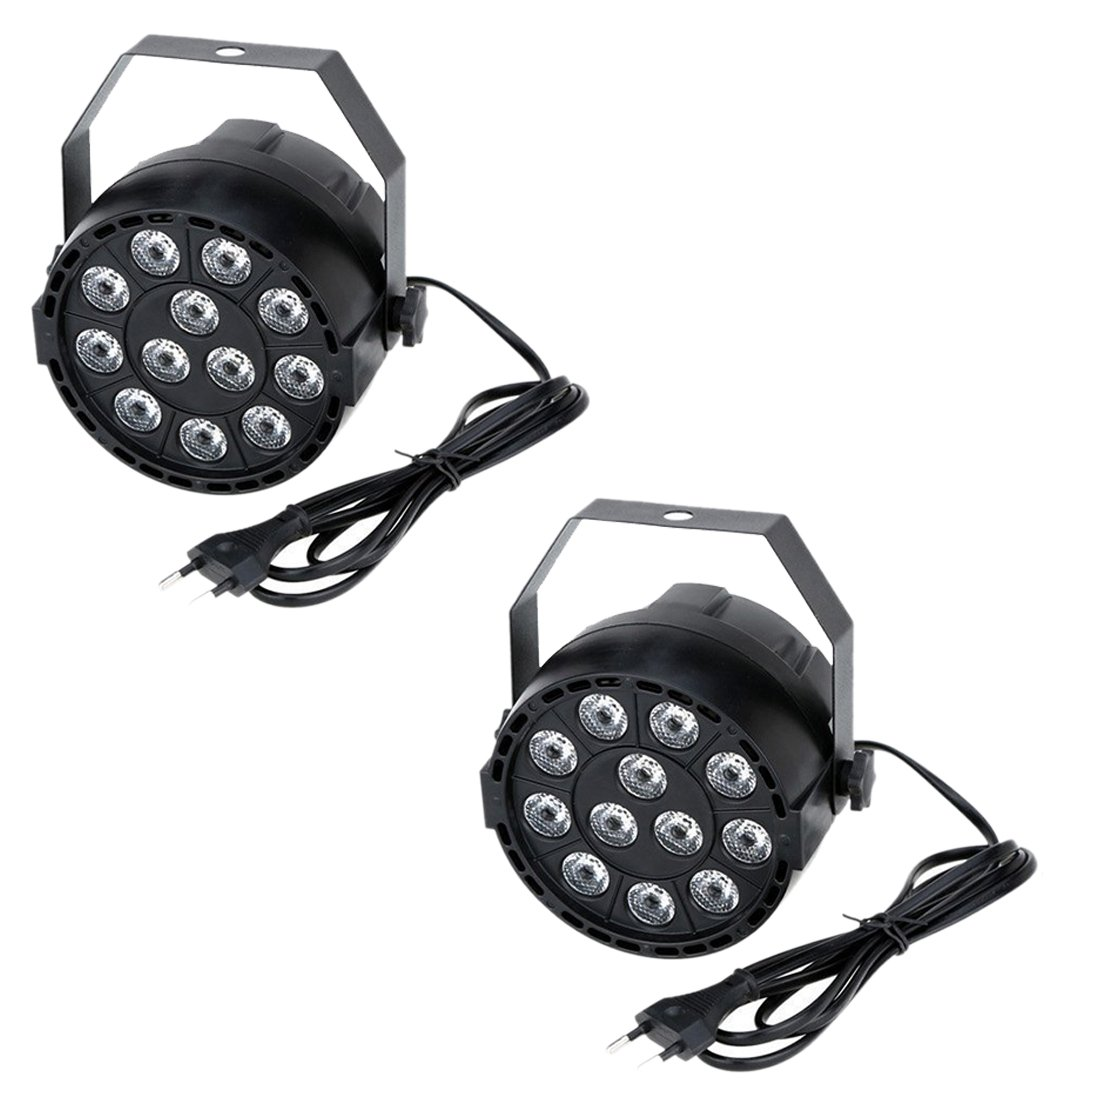 Disco Licht - SODIAL(R)2x15W DMX-512 RGBW LED DJ Lichteffekt Disco Beleuchtung 8 Kanal Wechselstrom 100-240V